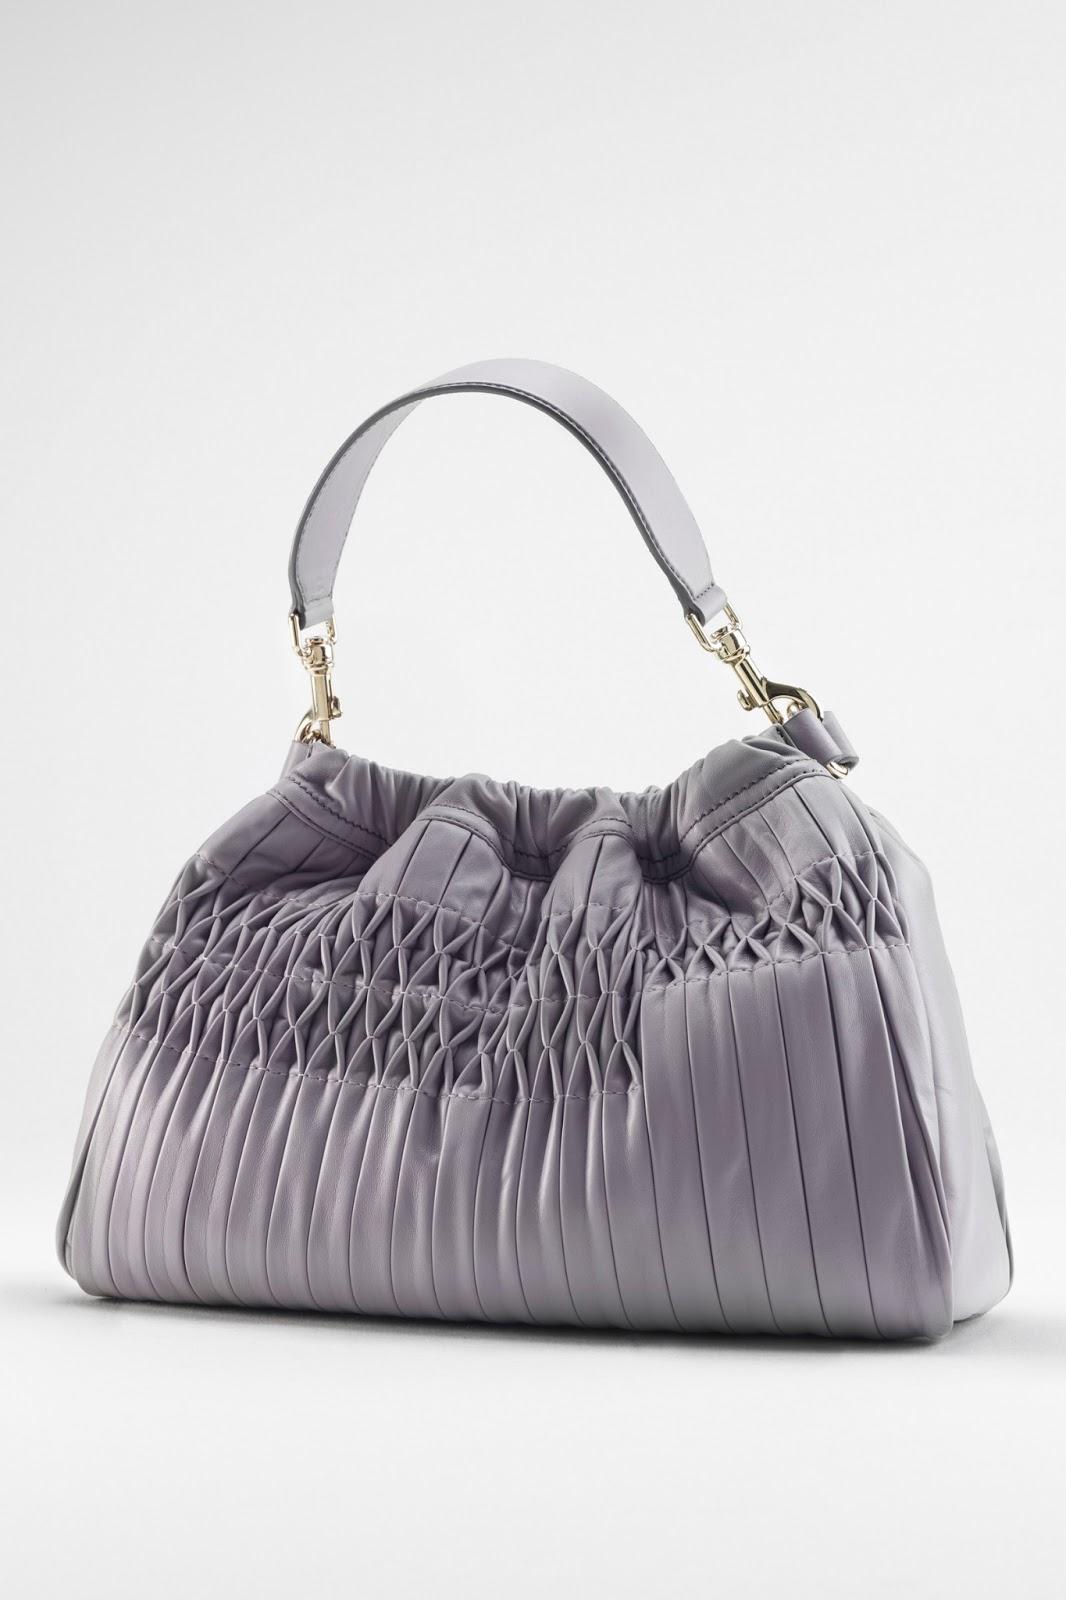 ... zenske torbe 1600 x 1600 1856 kb jpeg escada zenske tasne 001 torbe za